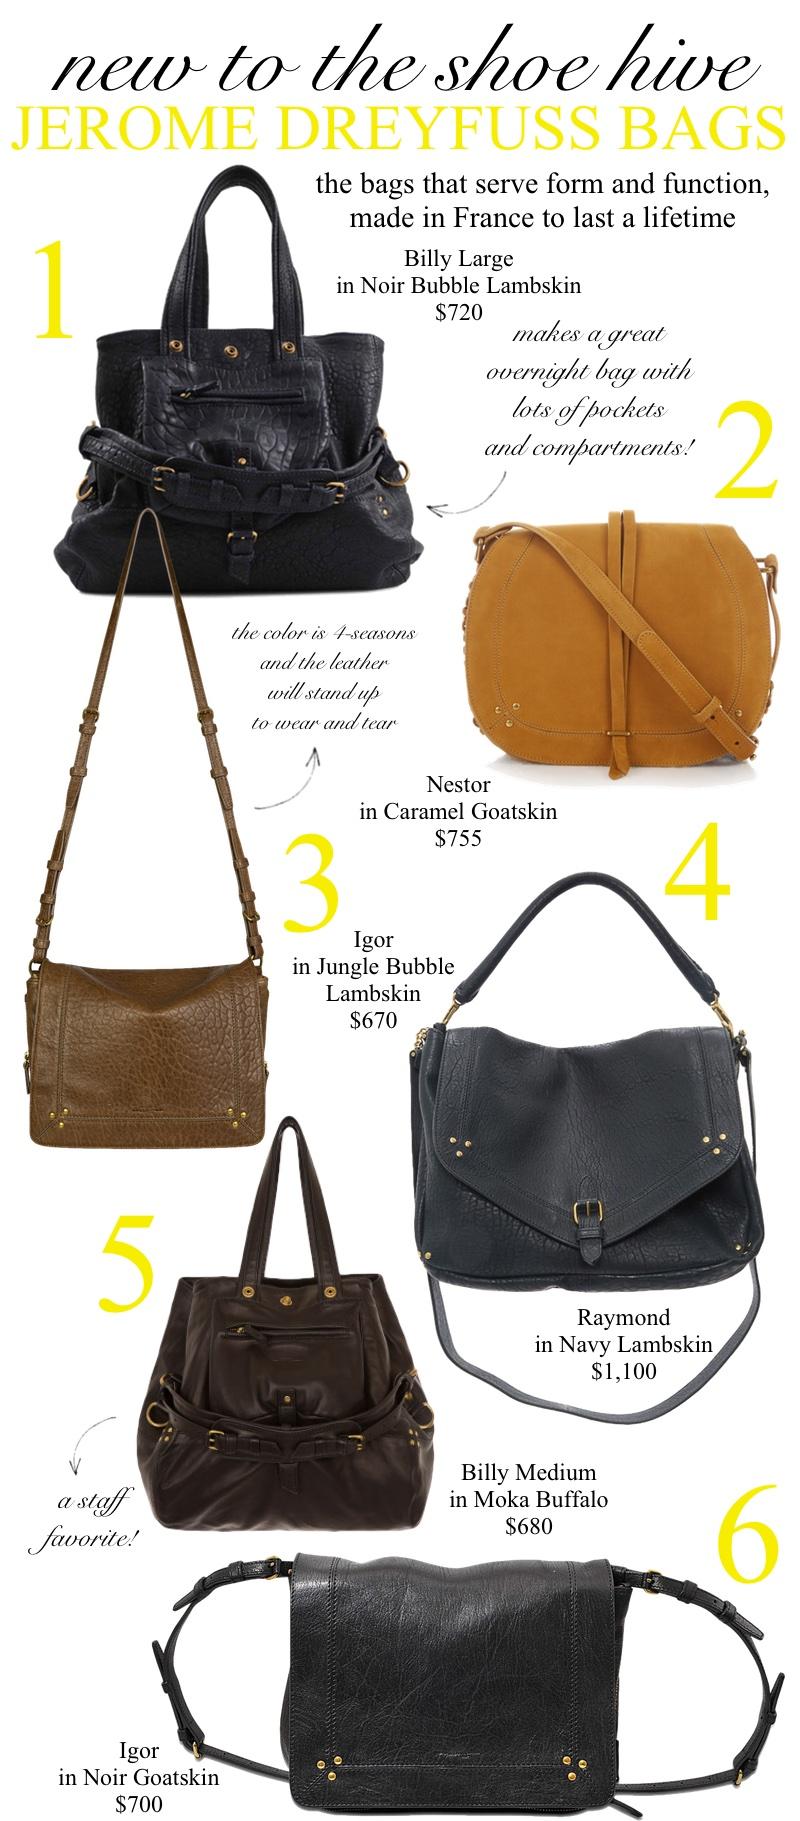 Jerome Dreyfuss Bags